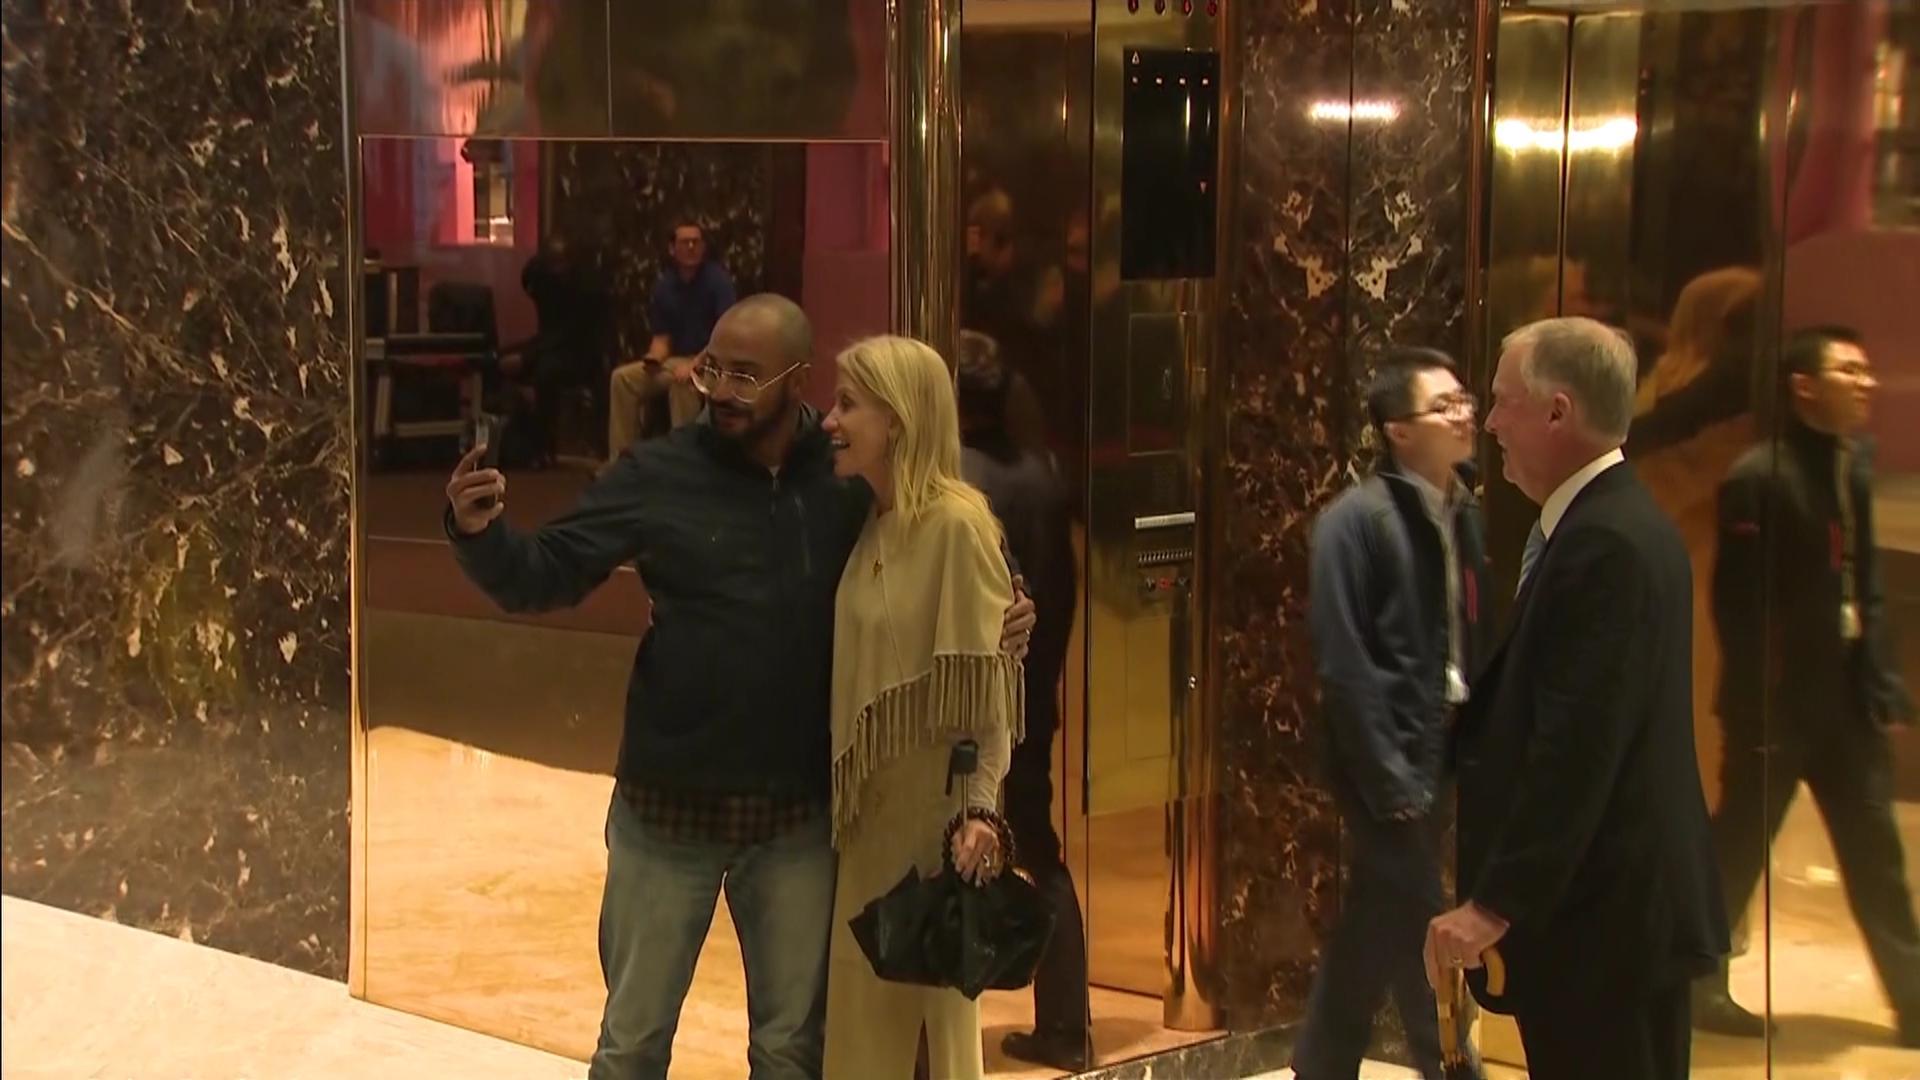 Pool Feed Trump Tower Lobby, Nov 29 2016   Video   C-SPAN.org